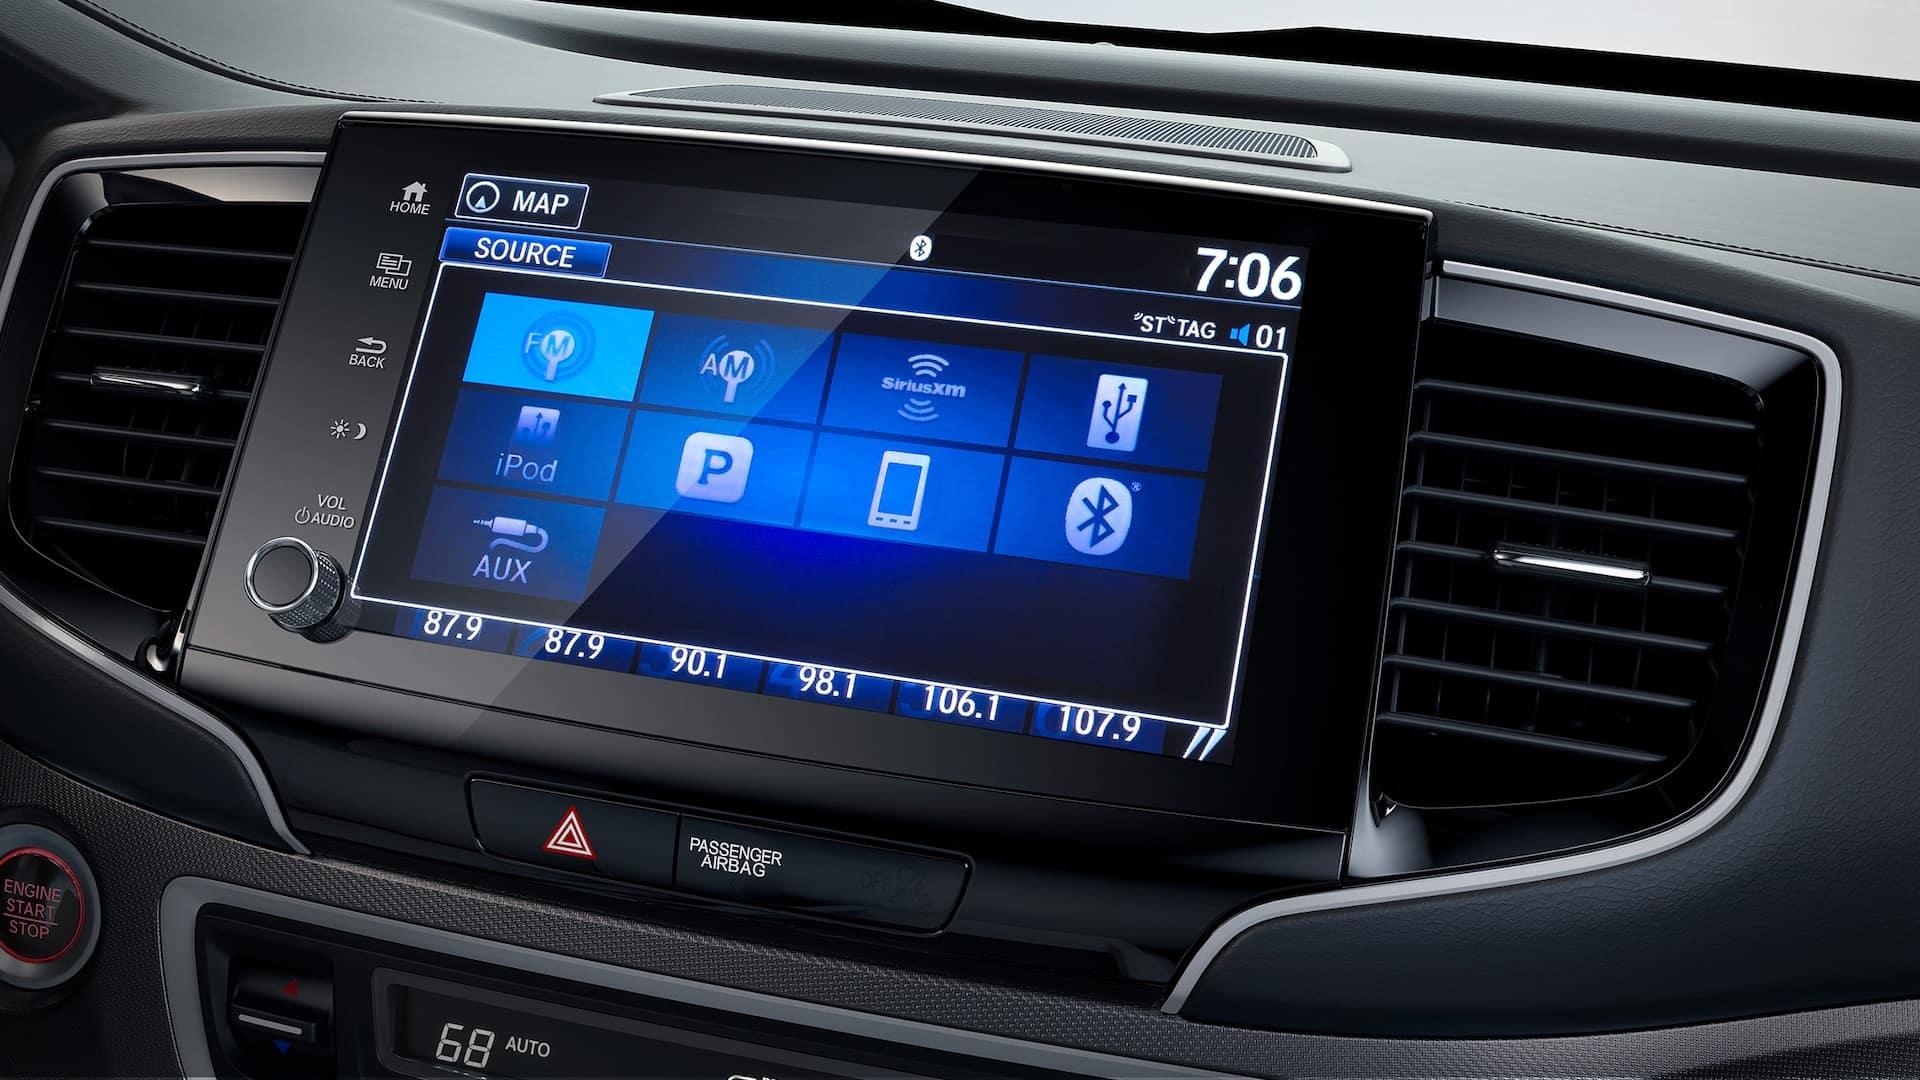 2021 Honda ridgeline with sirius xm satellite radio